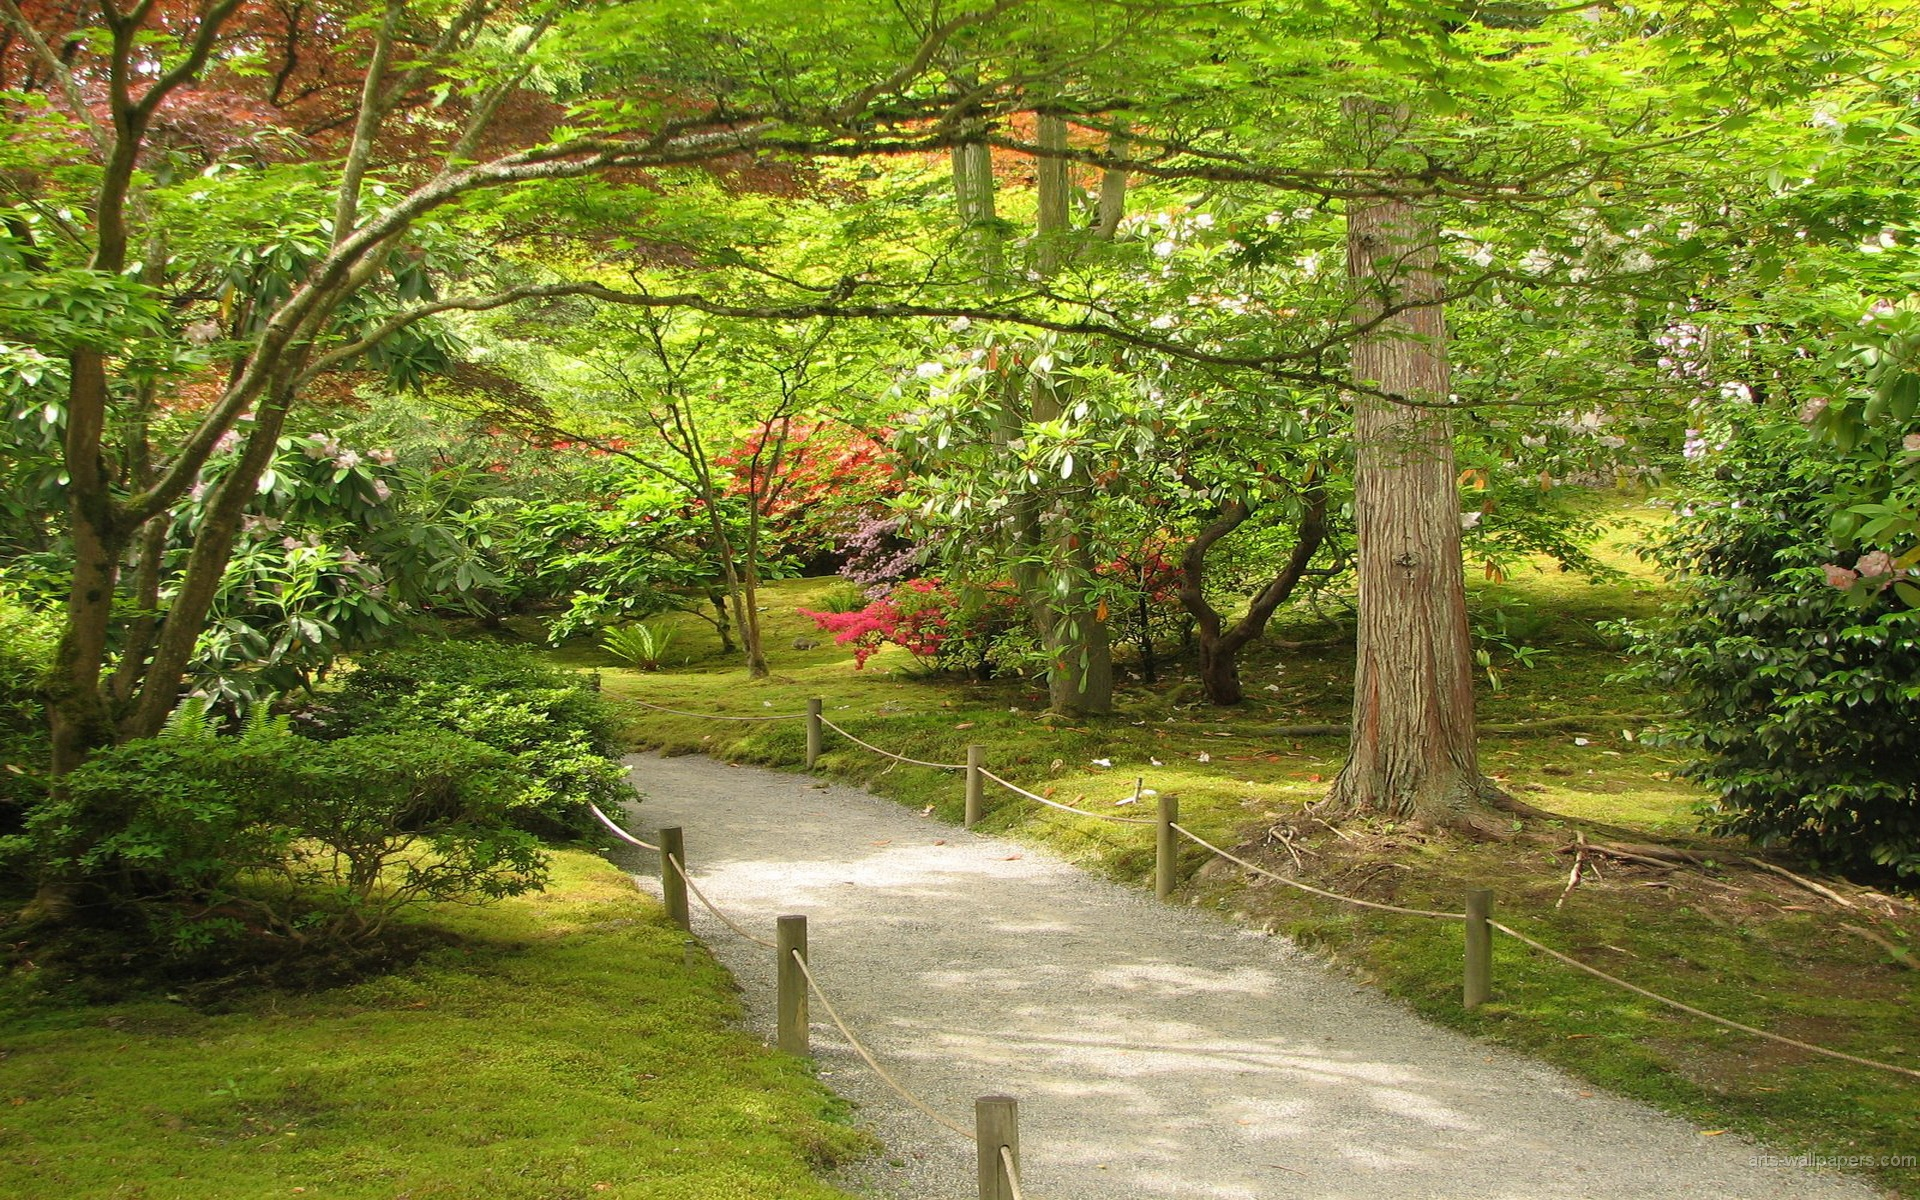 Japanese Garden Art Prints Art Wall And Posters Wall Murals Buy A .